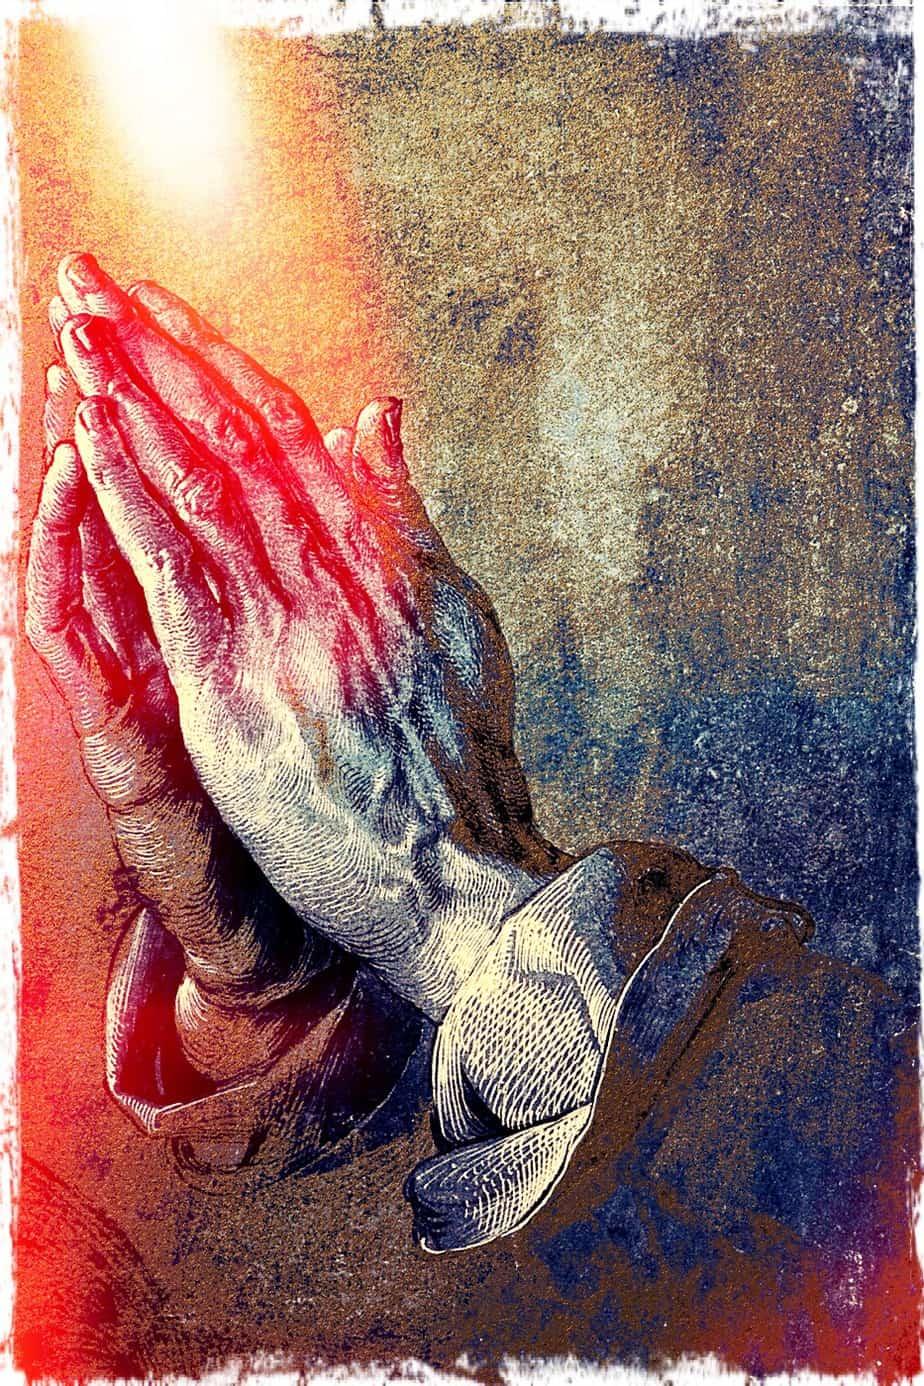 9 days of prayer before christmas